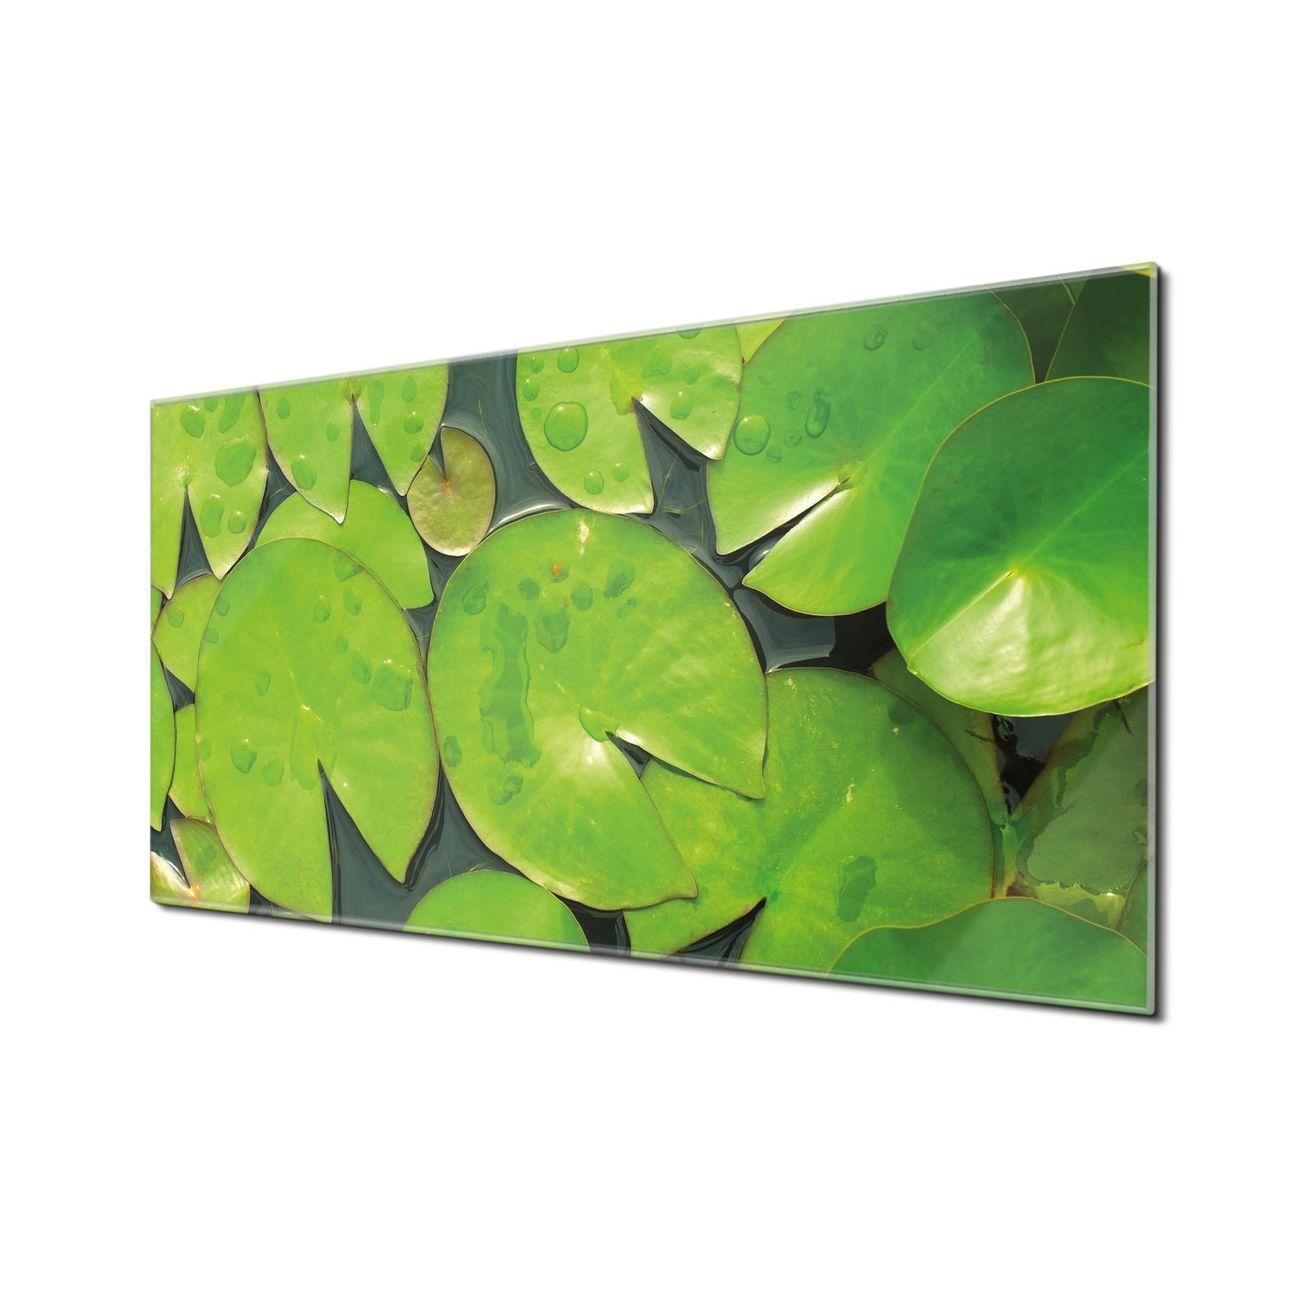 Küchenrückwand Glas Motiv Seerosenblätter